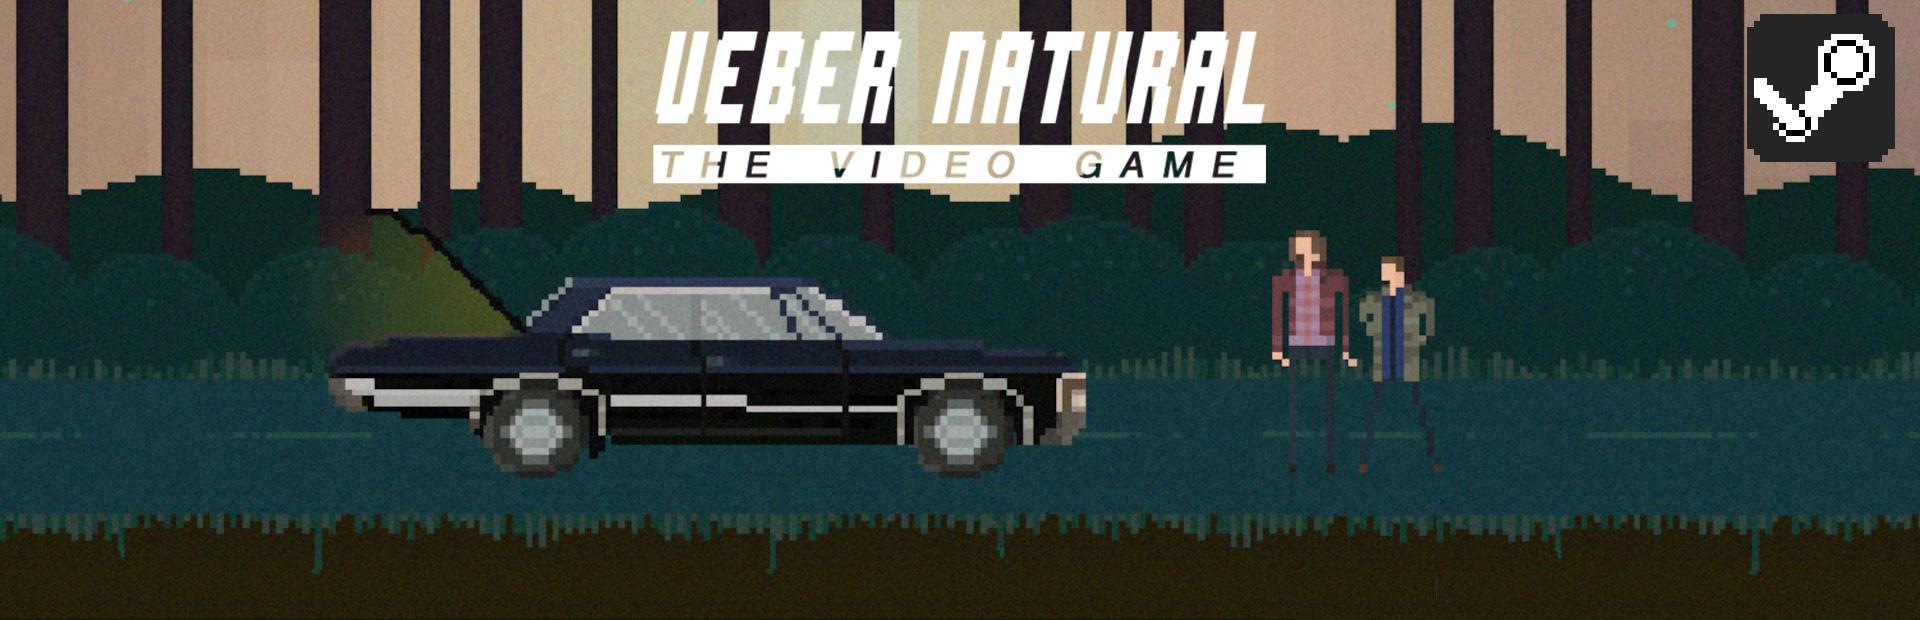 UEBERNATURAL - The Supernatural Fangame